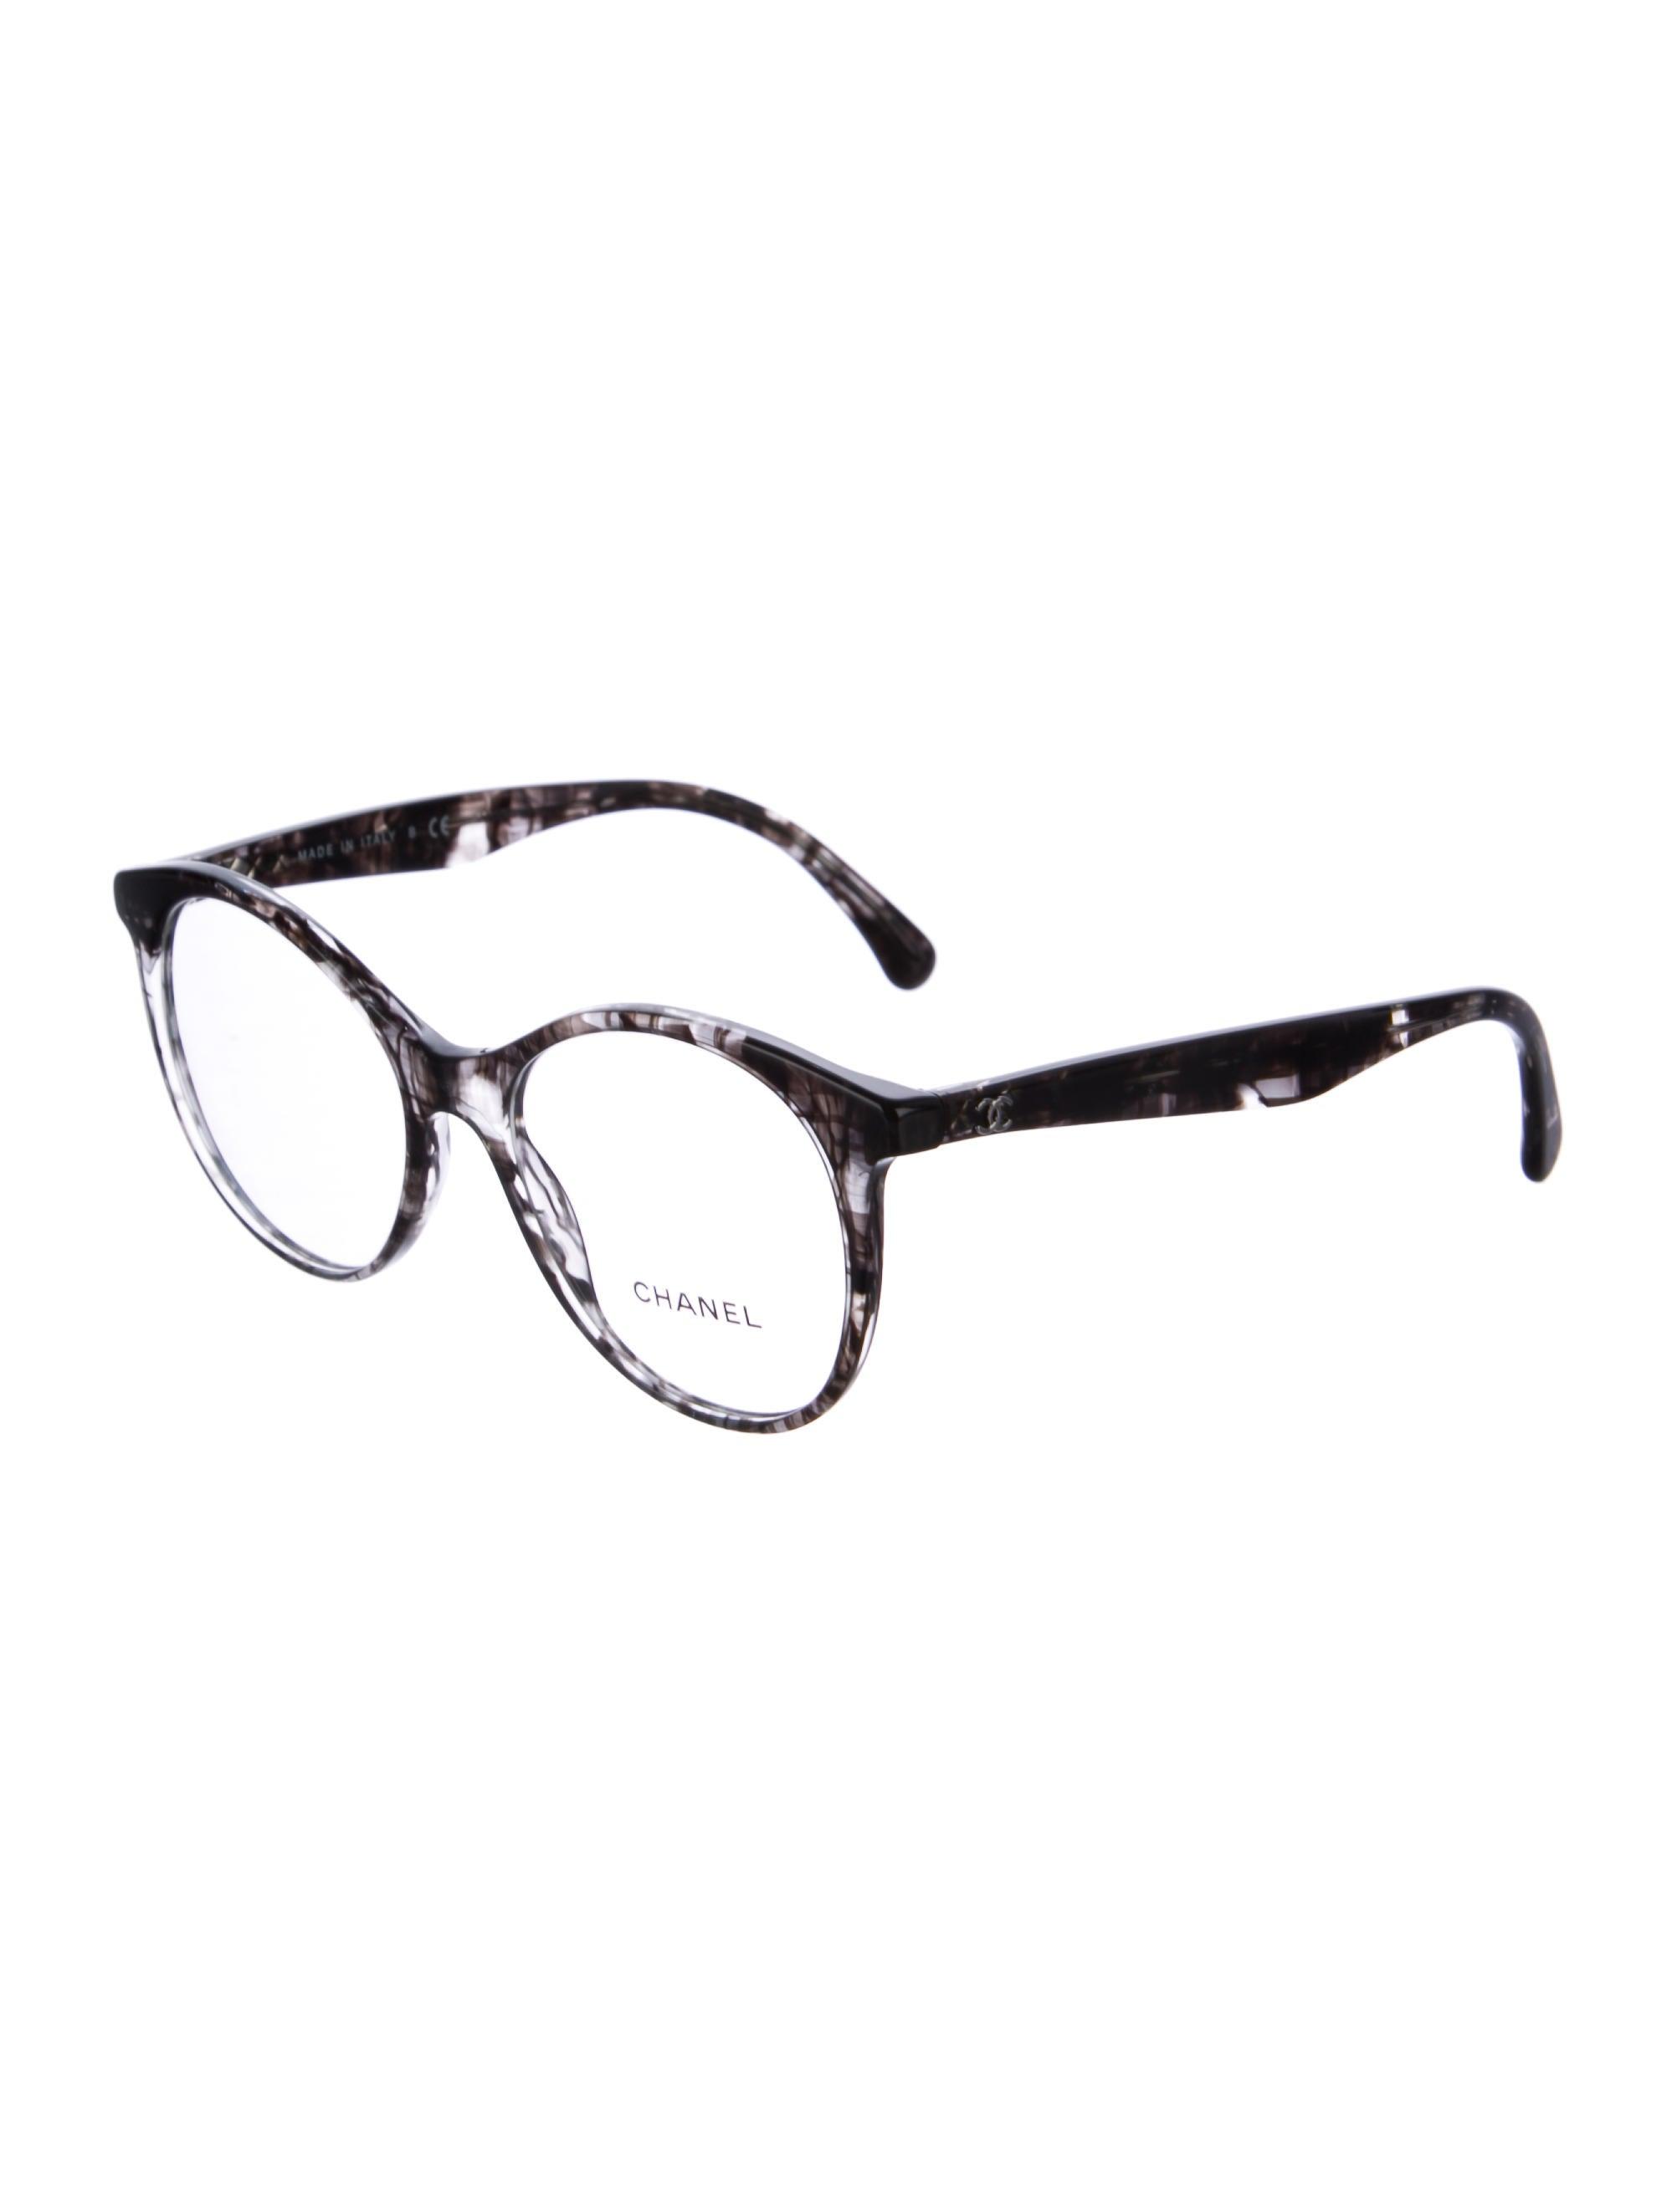 chanel cat eye eye glasses accessories cha203453 the